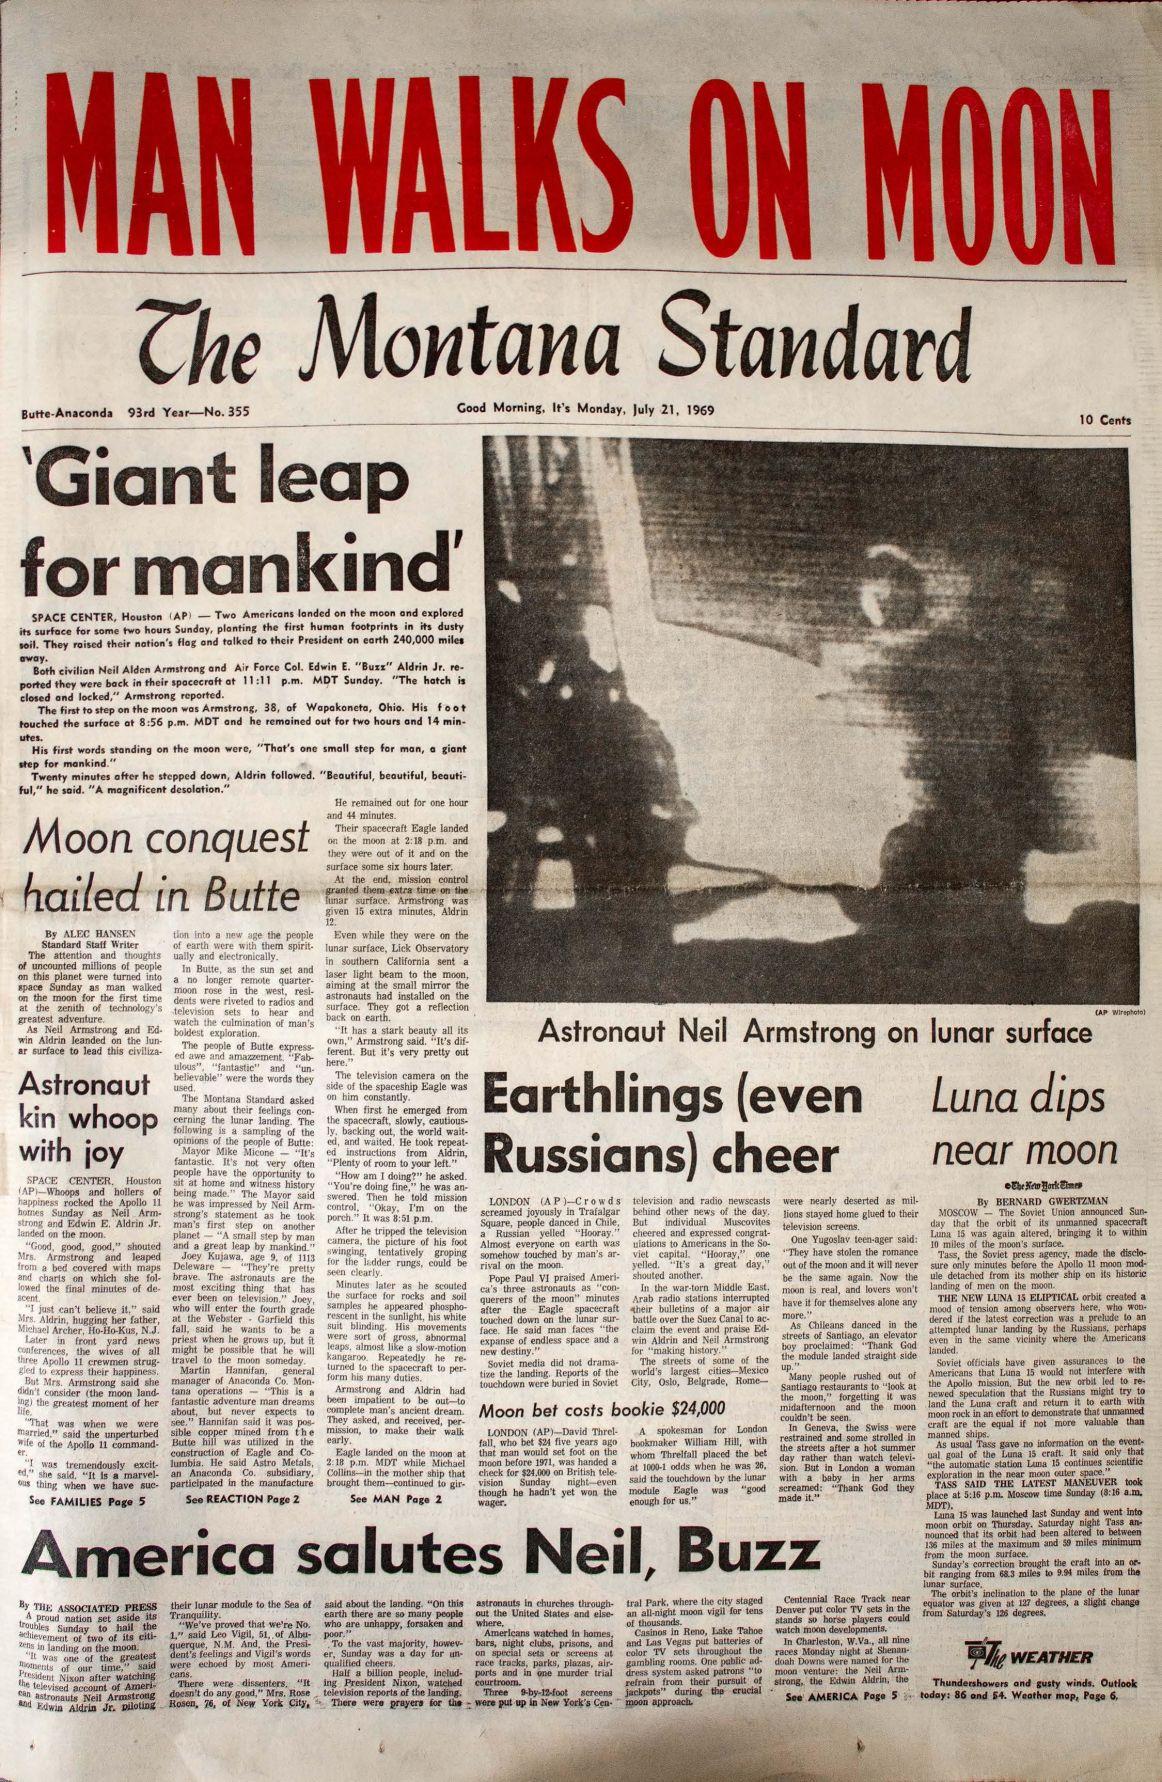 50th Anniversary Man Walks On Moon